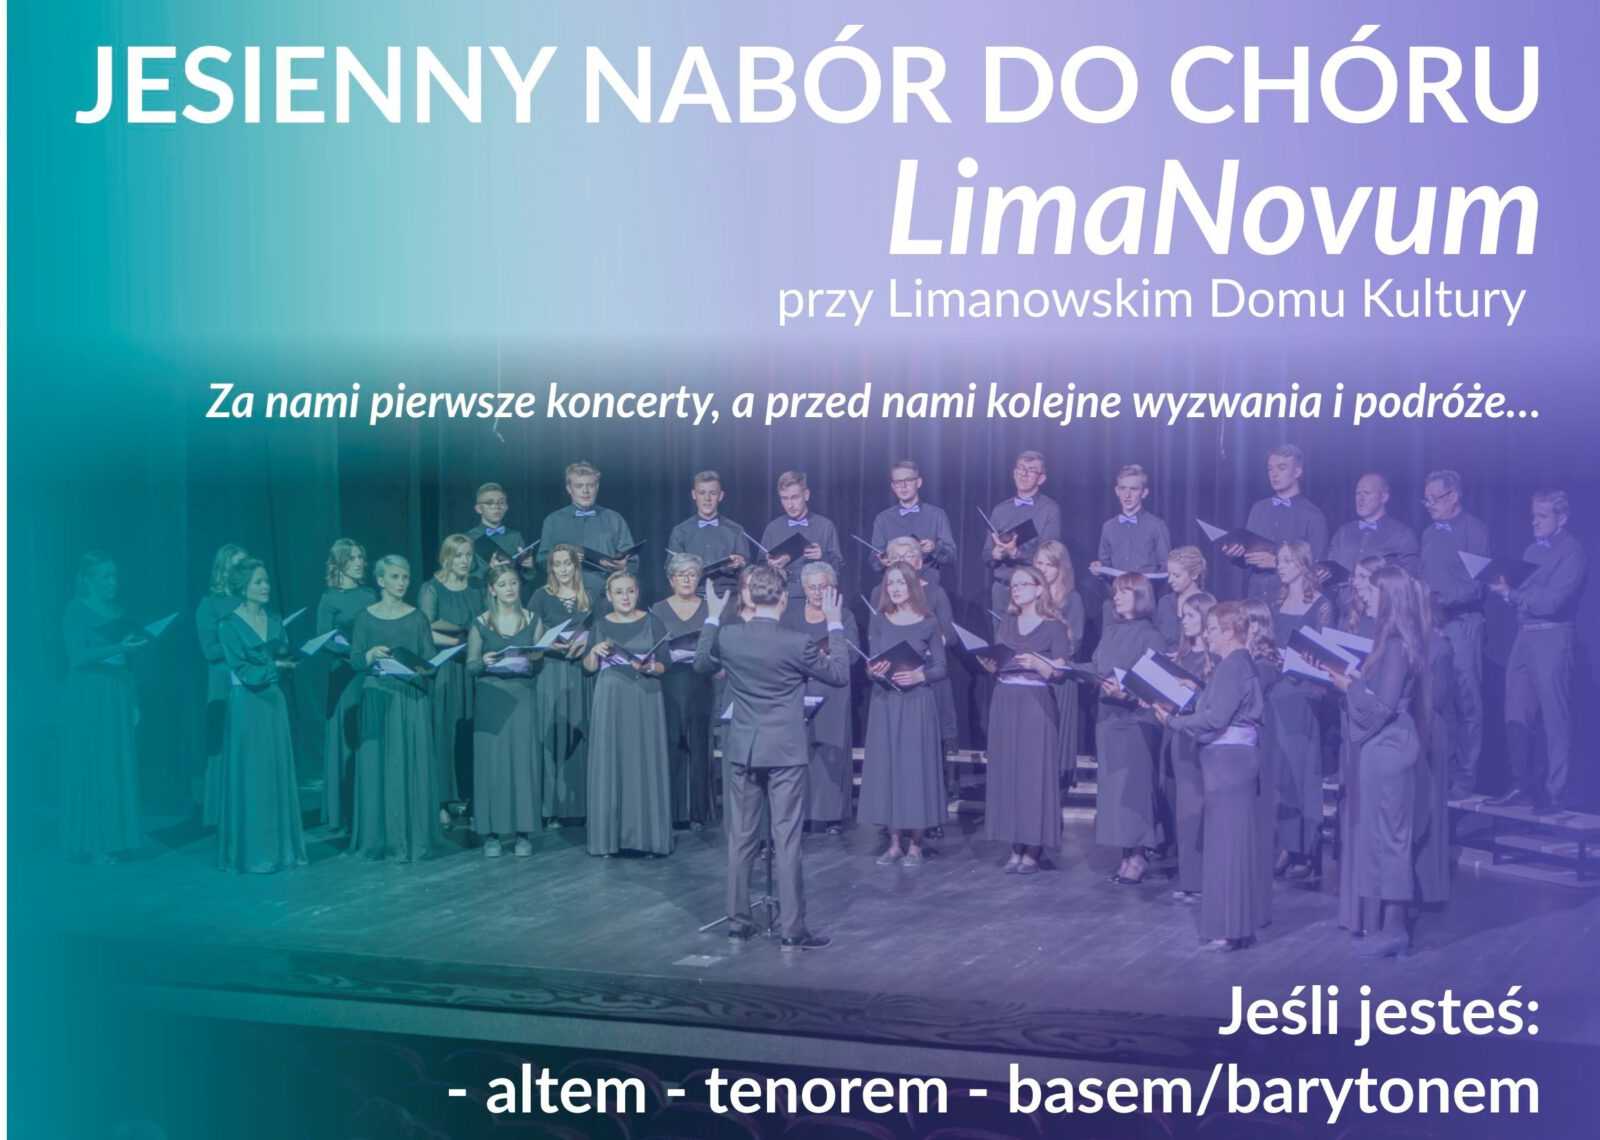 Plakat informujący o naborze do chóru LimaNovum